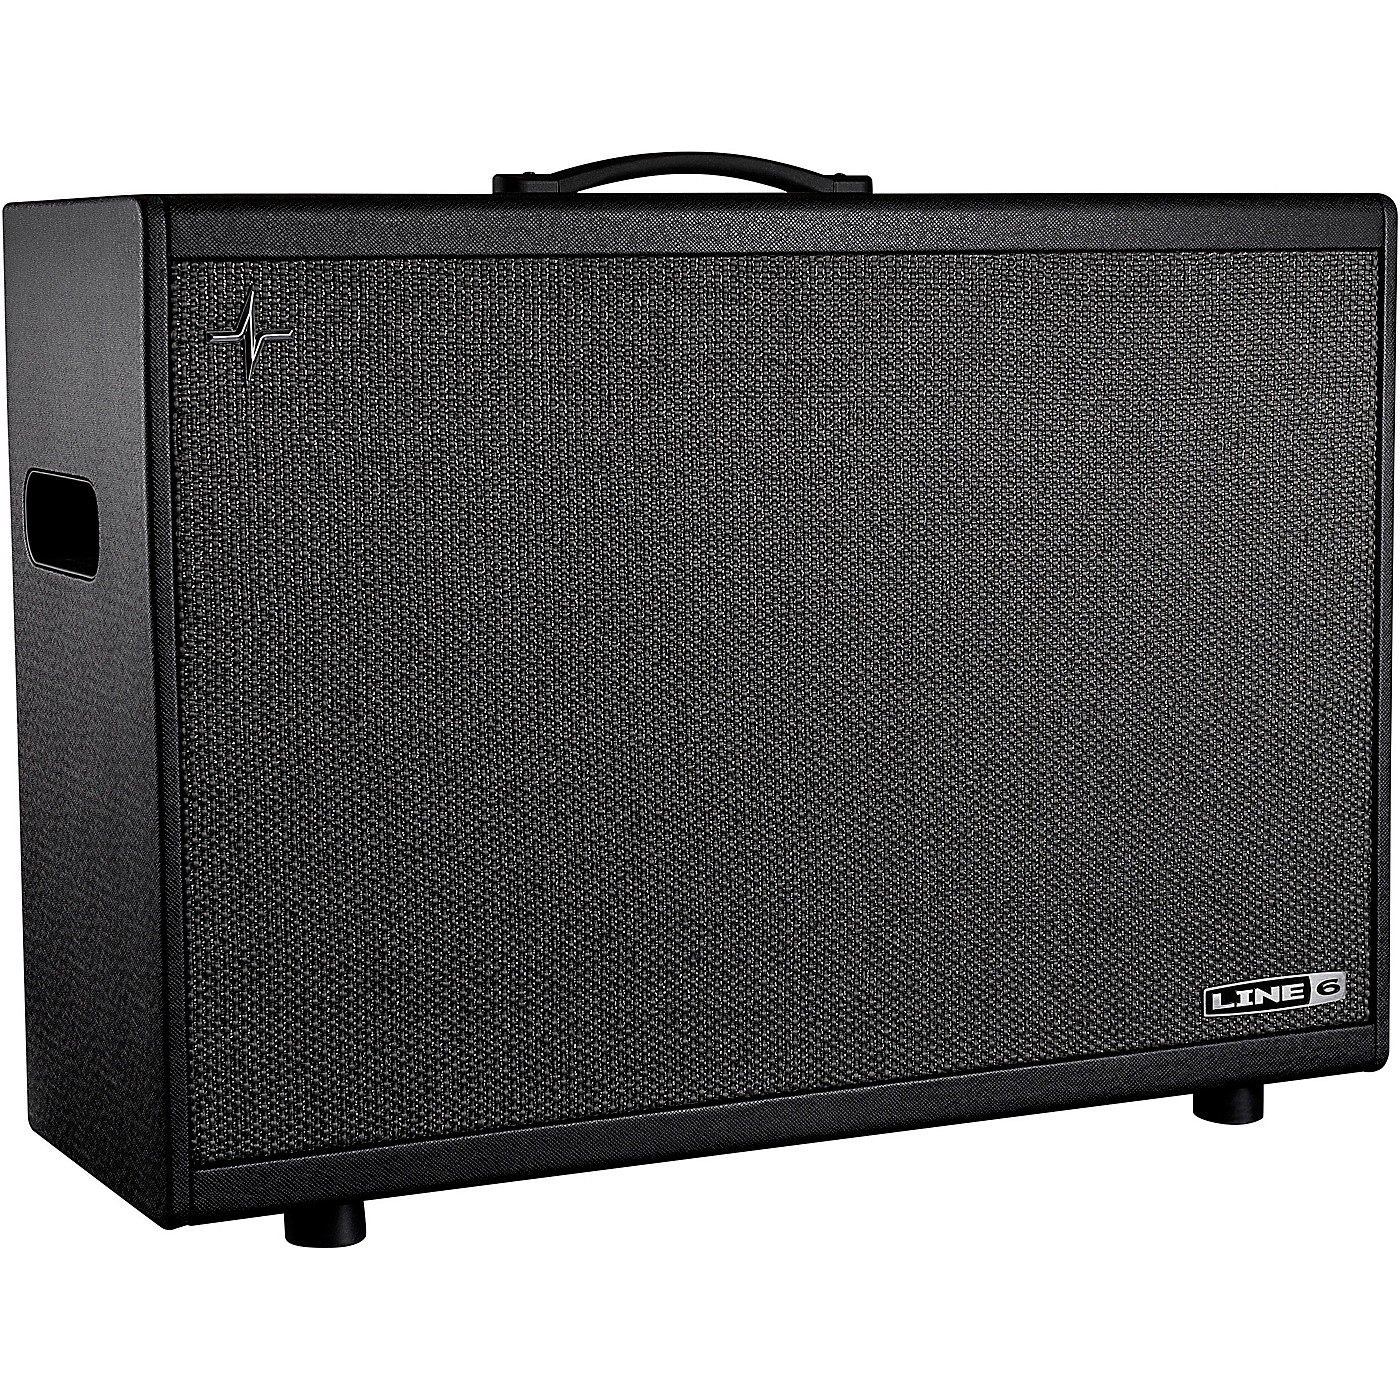 Line 6 Powercab 212 Plus 500W 2x12 Powered Stereo Guitar Speaker Cab thumbnail